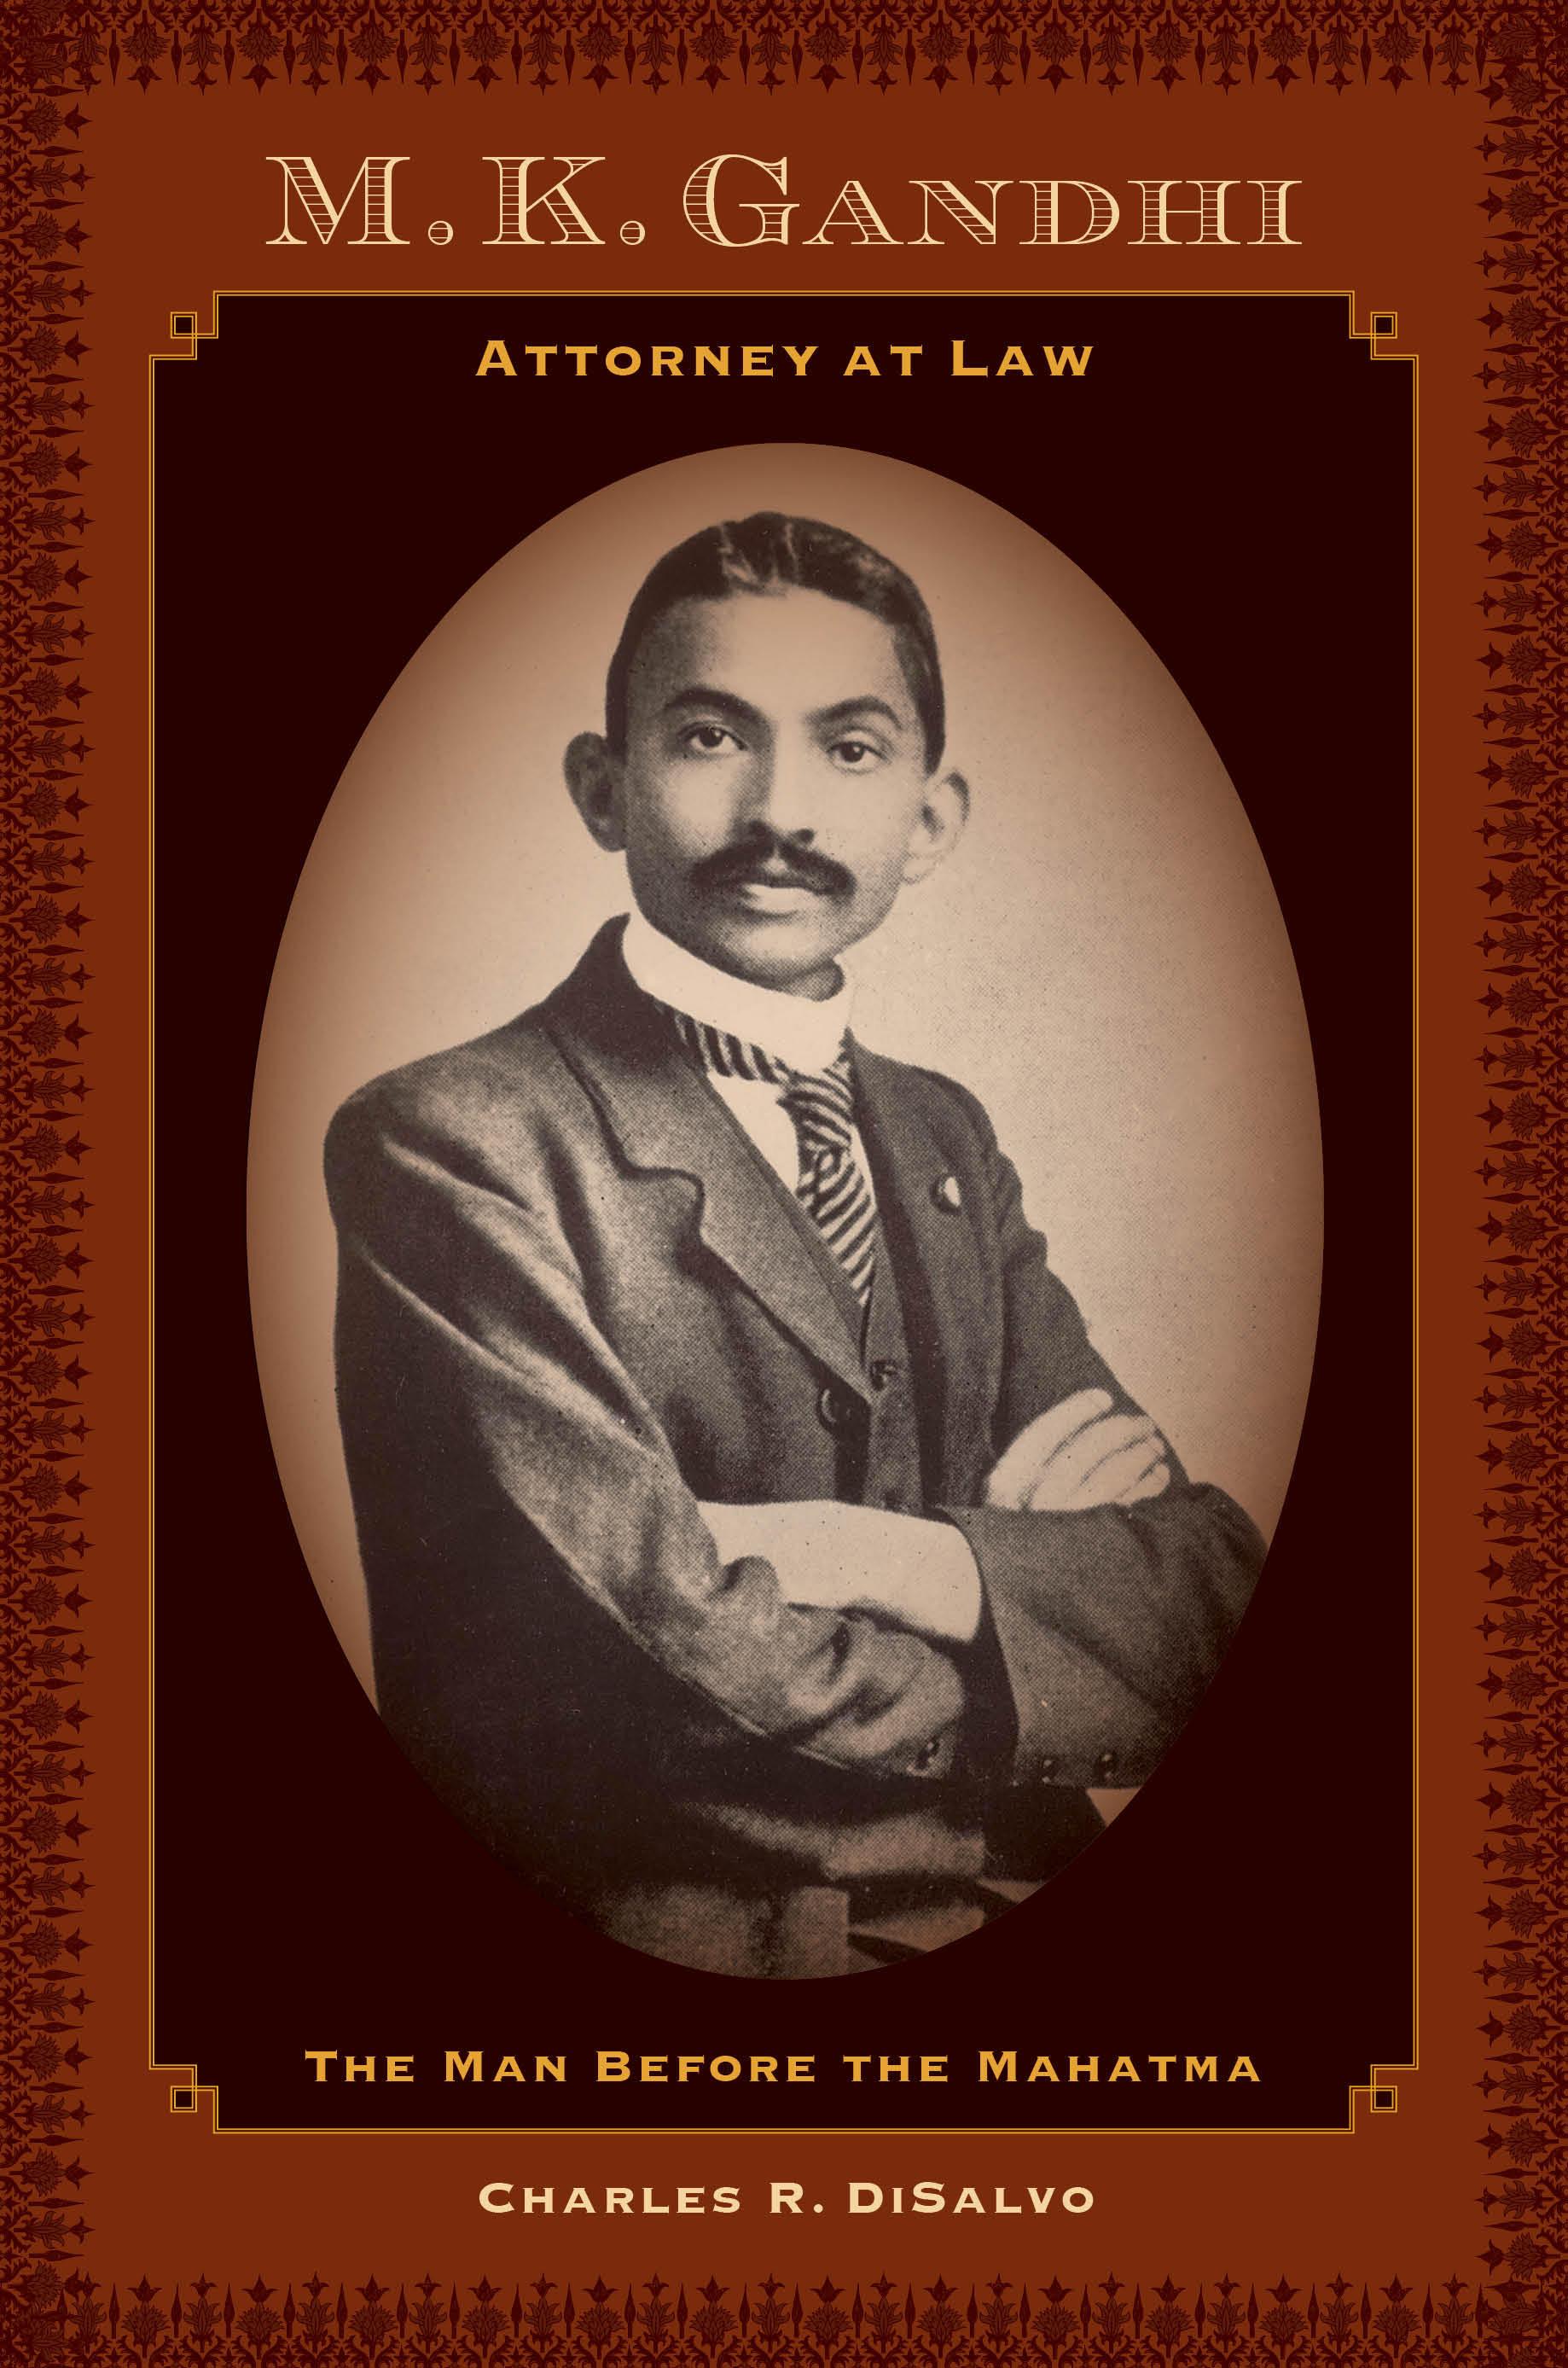 biography on mahatma gandhi in short